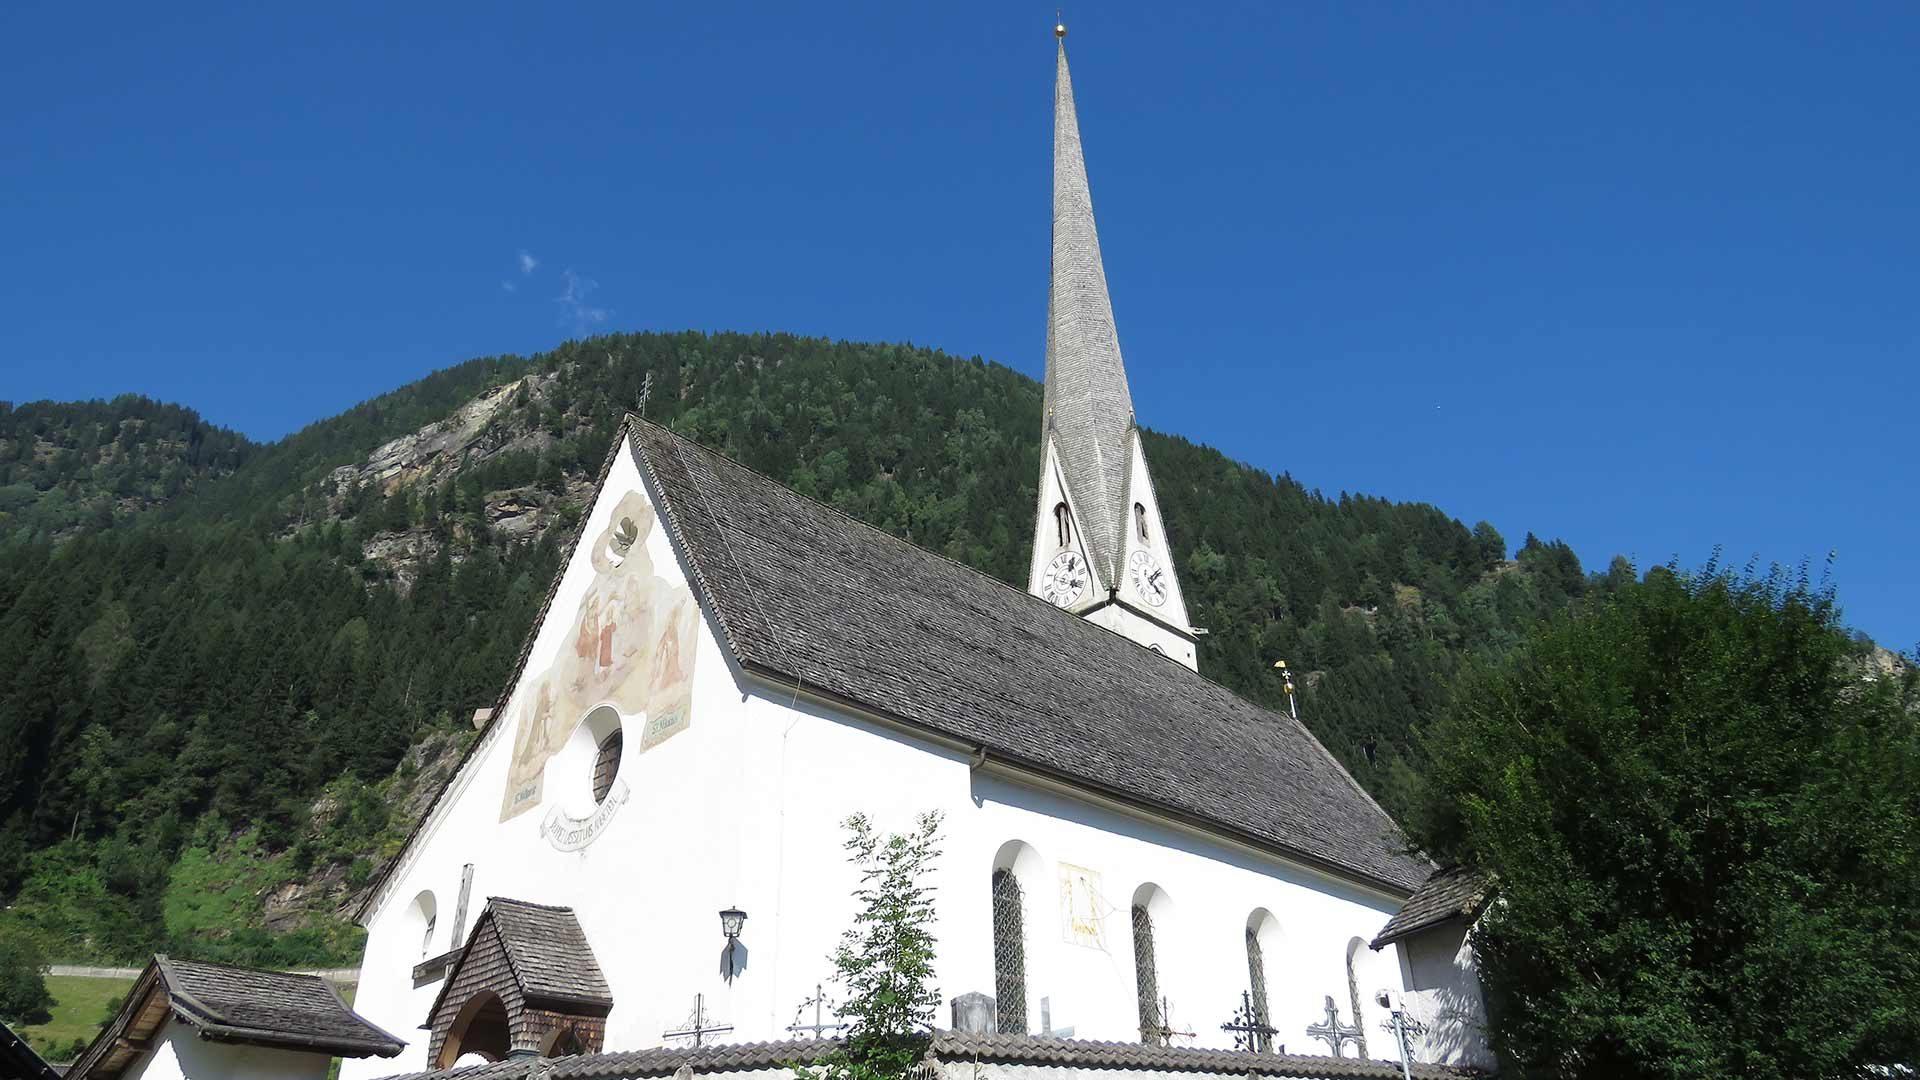 La Chiesa Parrocchiale Santa Maria Assunta a Moso